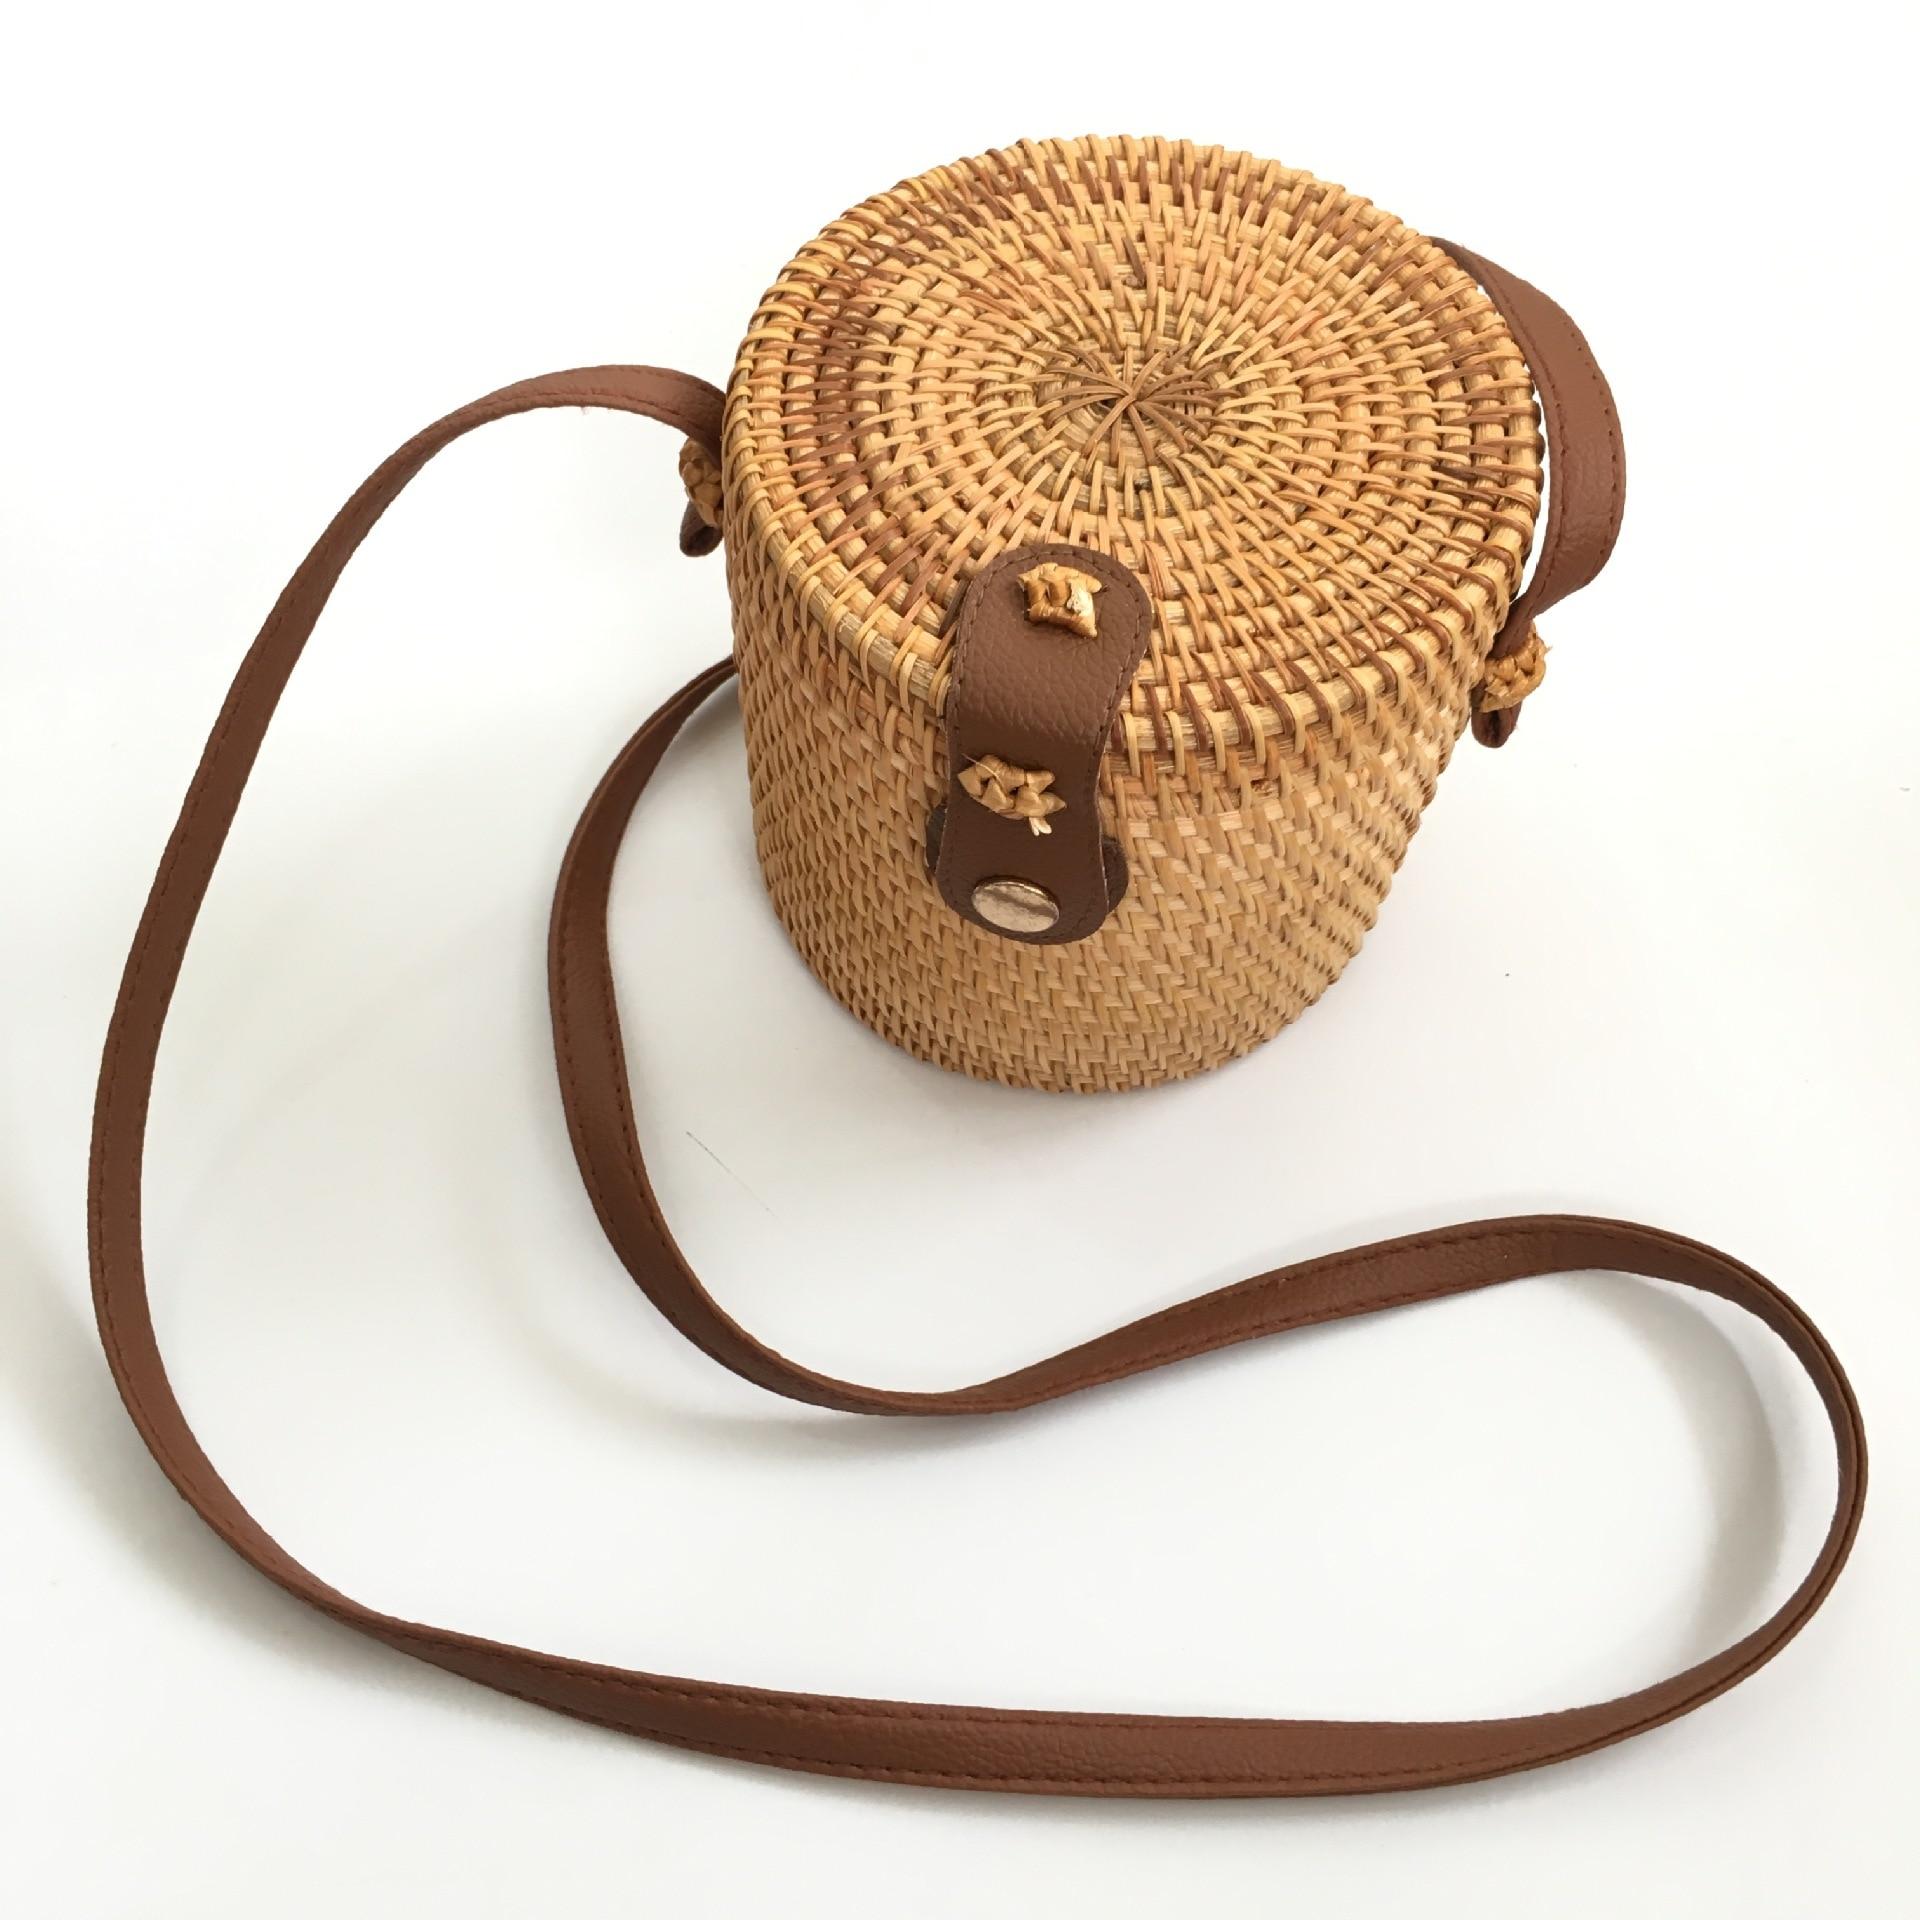 Reasonable Creative Tassel Bucket Barrel Straw Handbags Women Luxury Bags Designer Woven Crossbody Bags Metal Handle Barrel Tote Beach Luggage & Bags